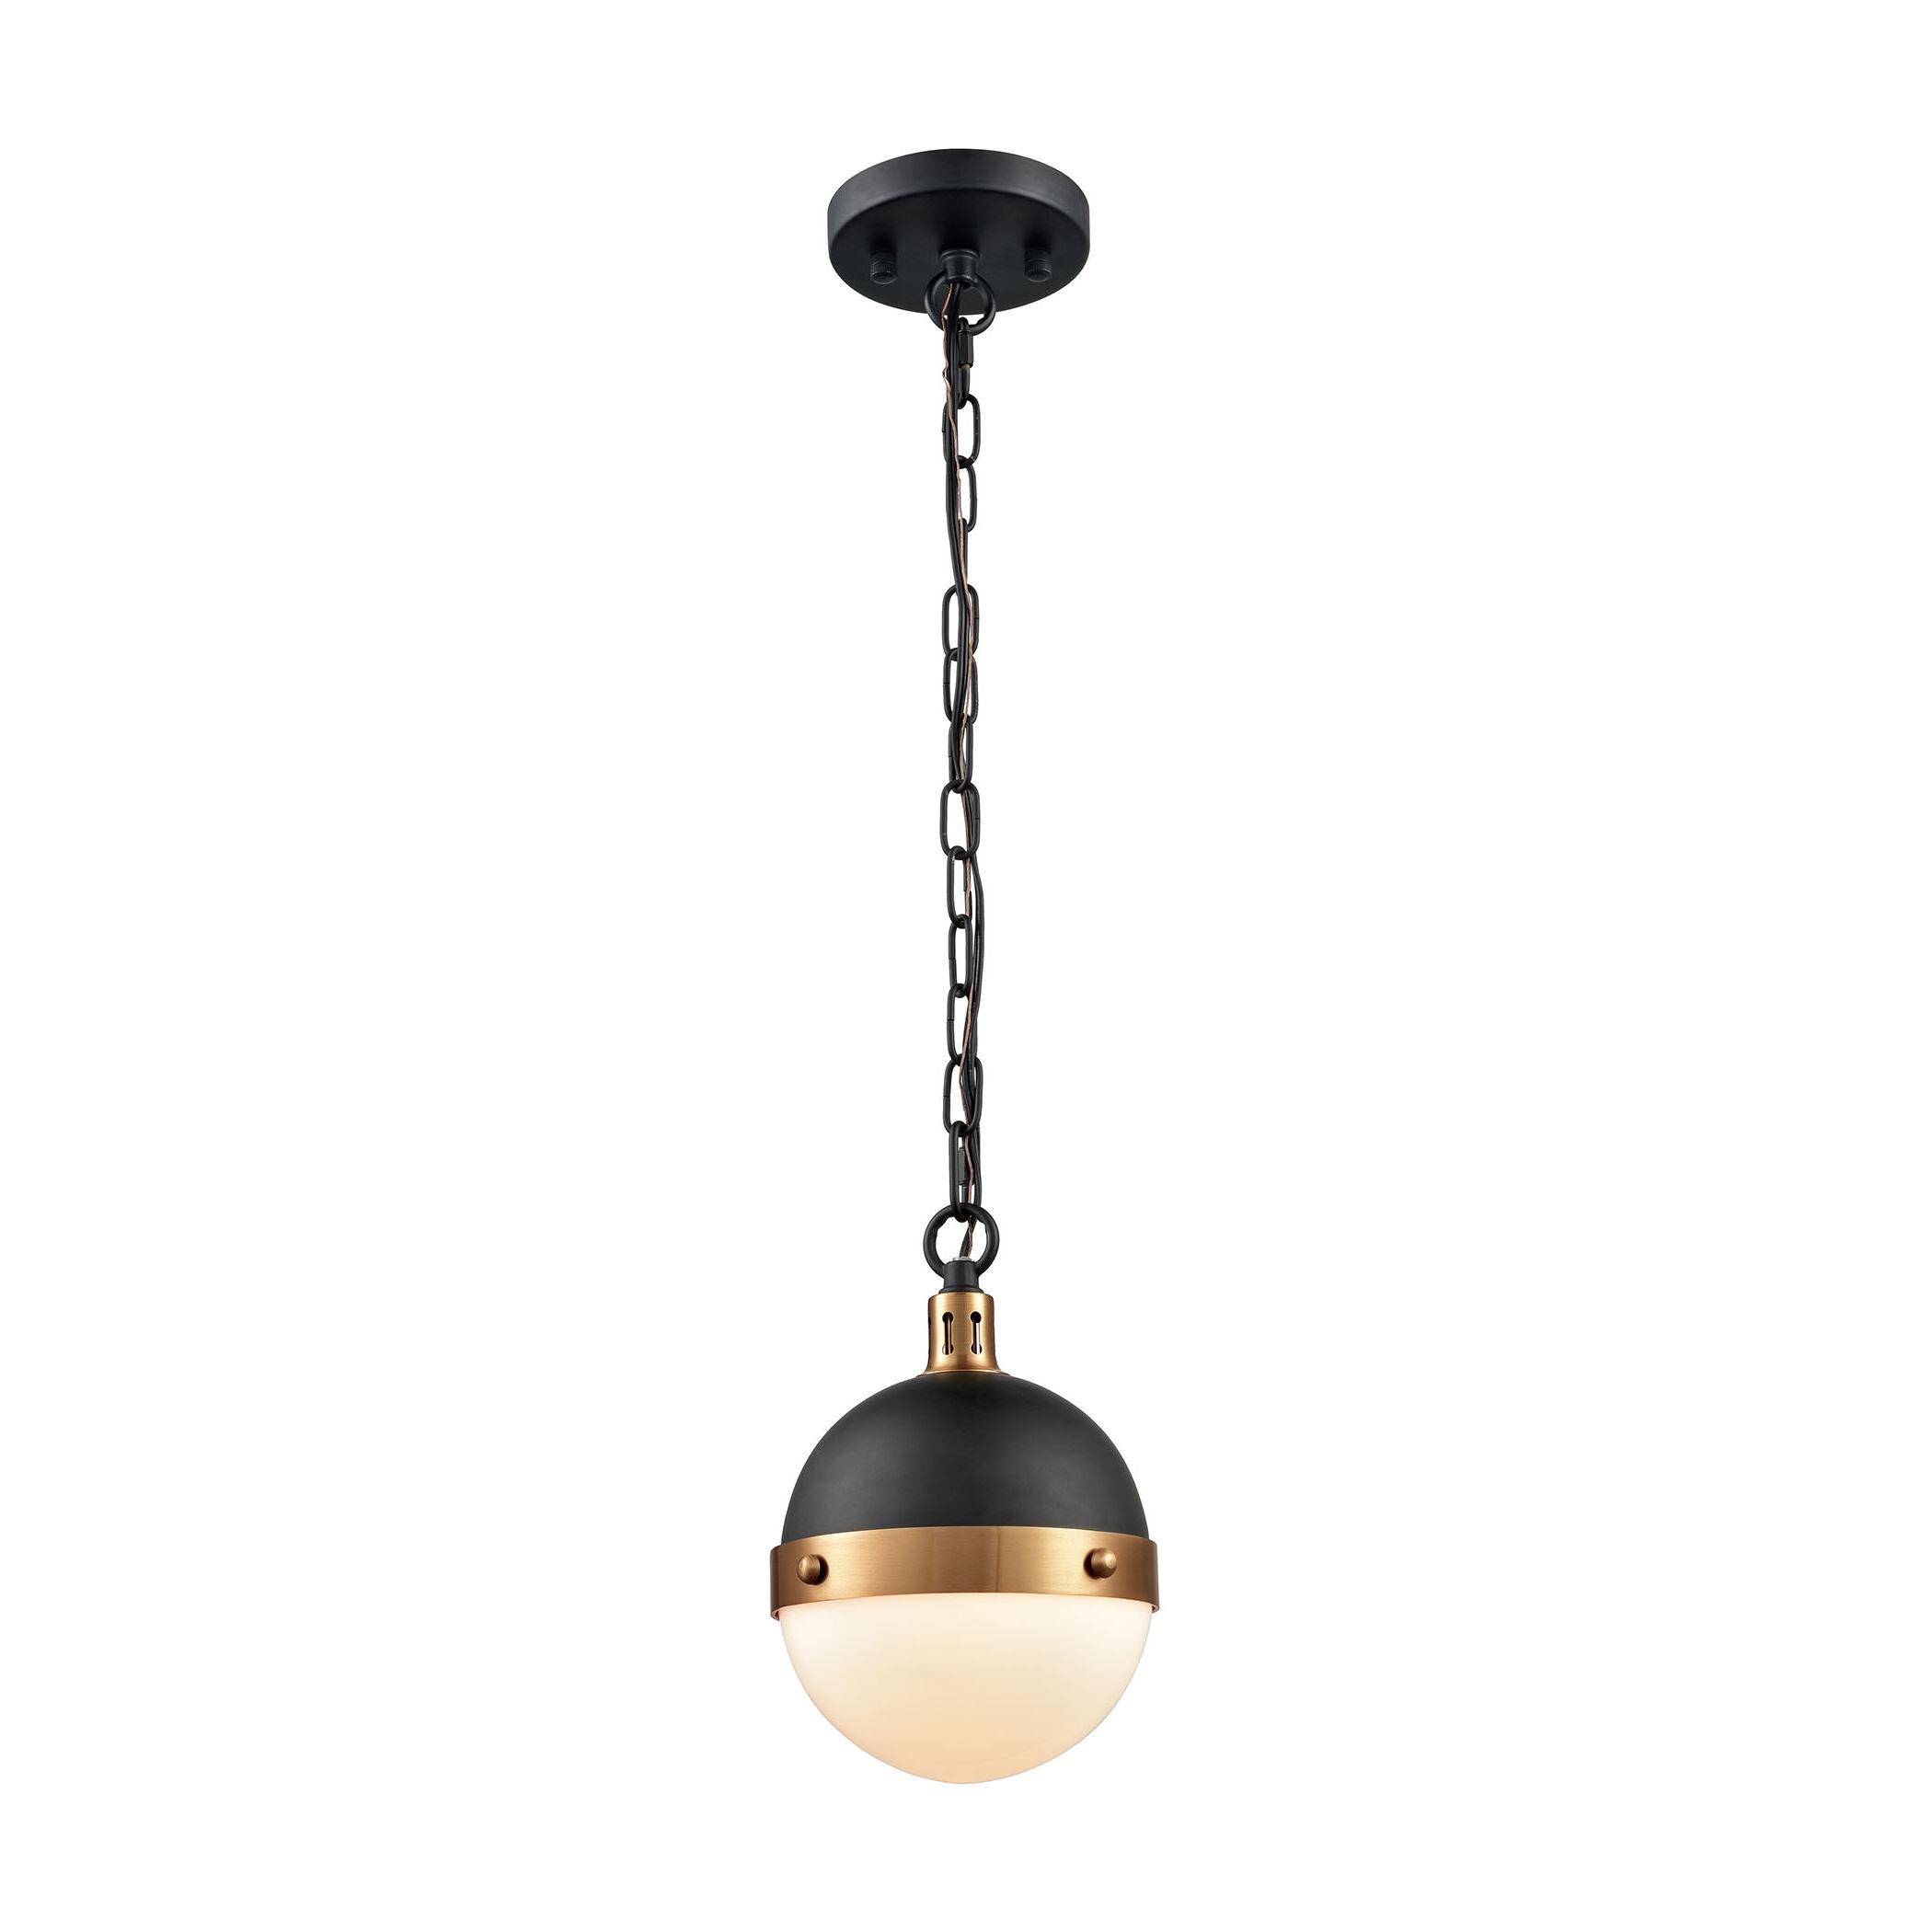 Bautista 1 Light Single Globe Pendants Regarding Popular Wein 1 Light Single Globe Pendant (View 4 of 20)